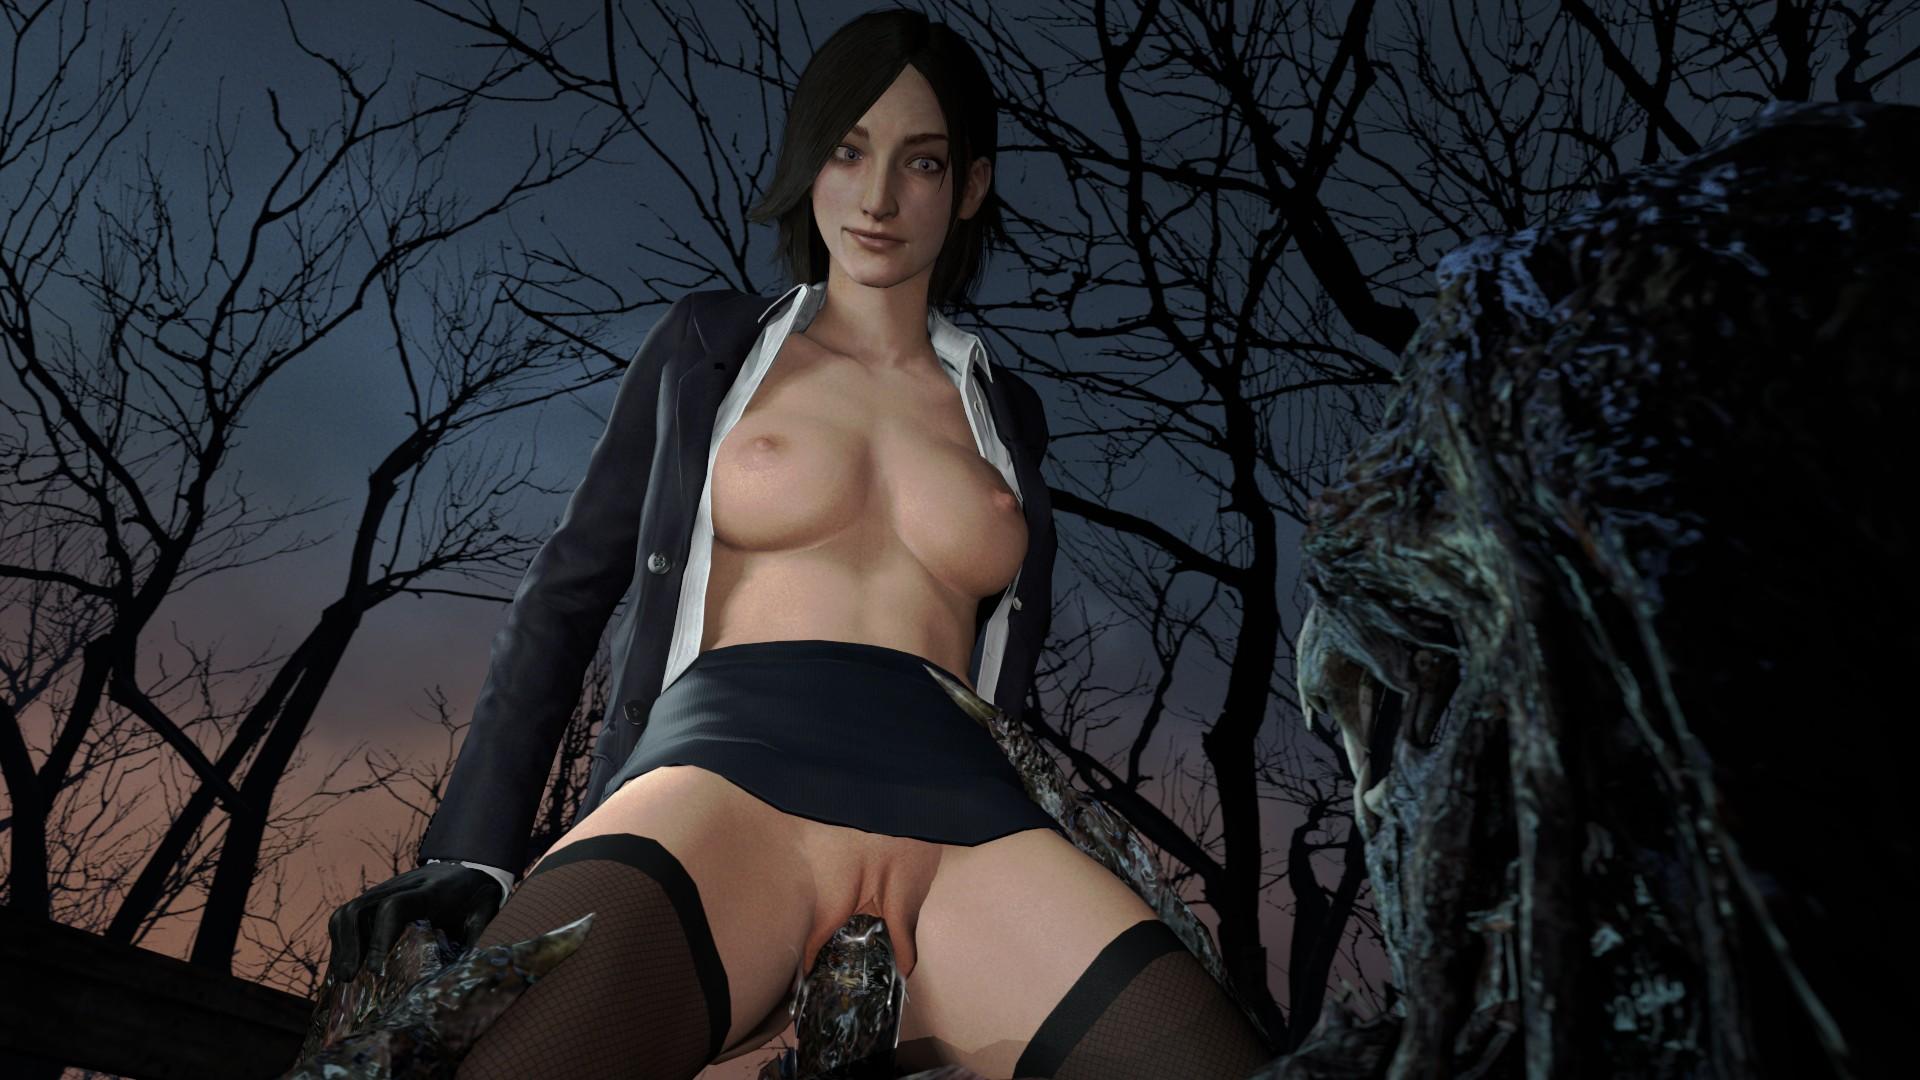 Resident evil порно онлайн